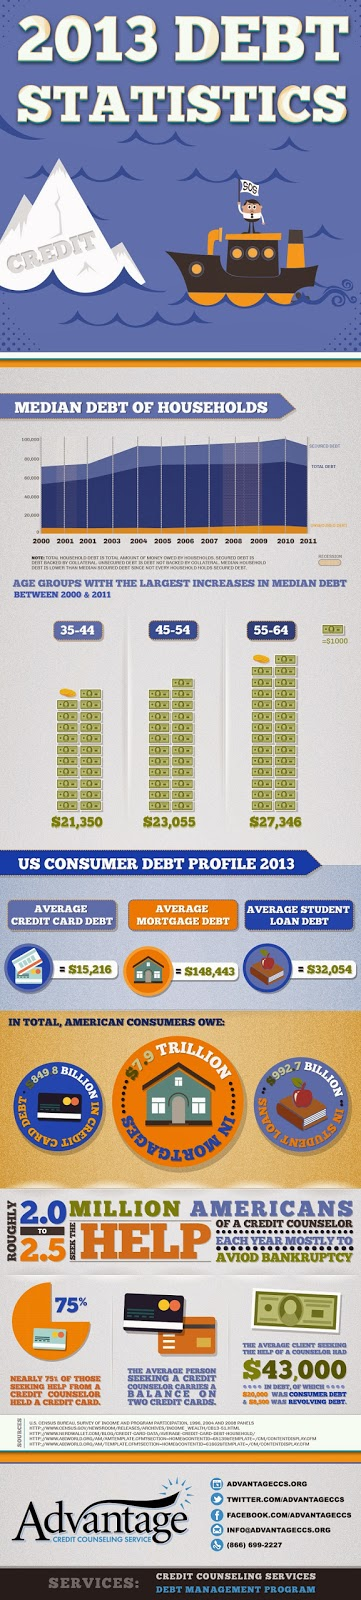 http://www.advantageccs.org/infographic-debt-statistics